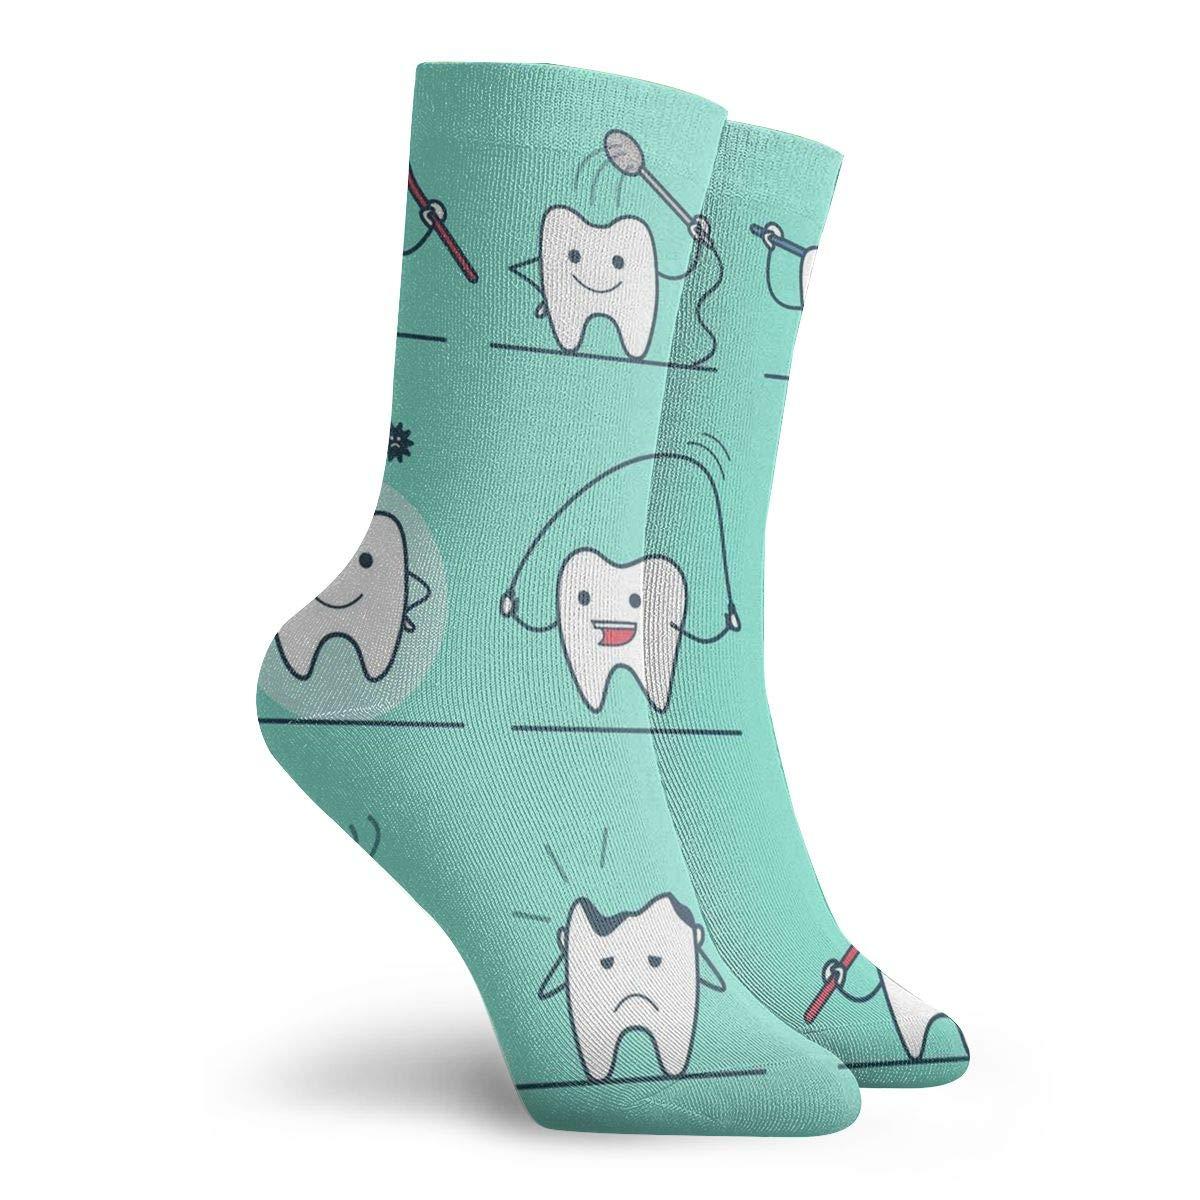 Teeth Exercise Unisex Funny Casual Crew Socks Athletic Socks For Boys Girls Kids Teenagers